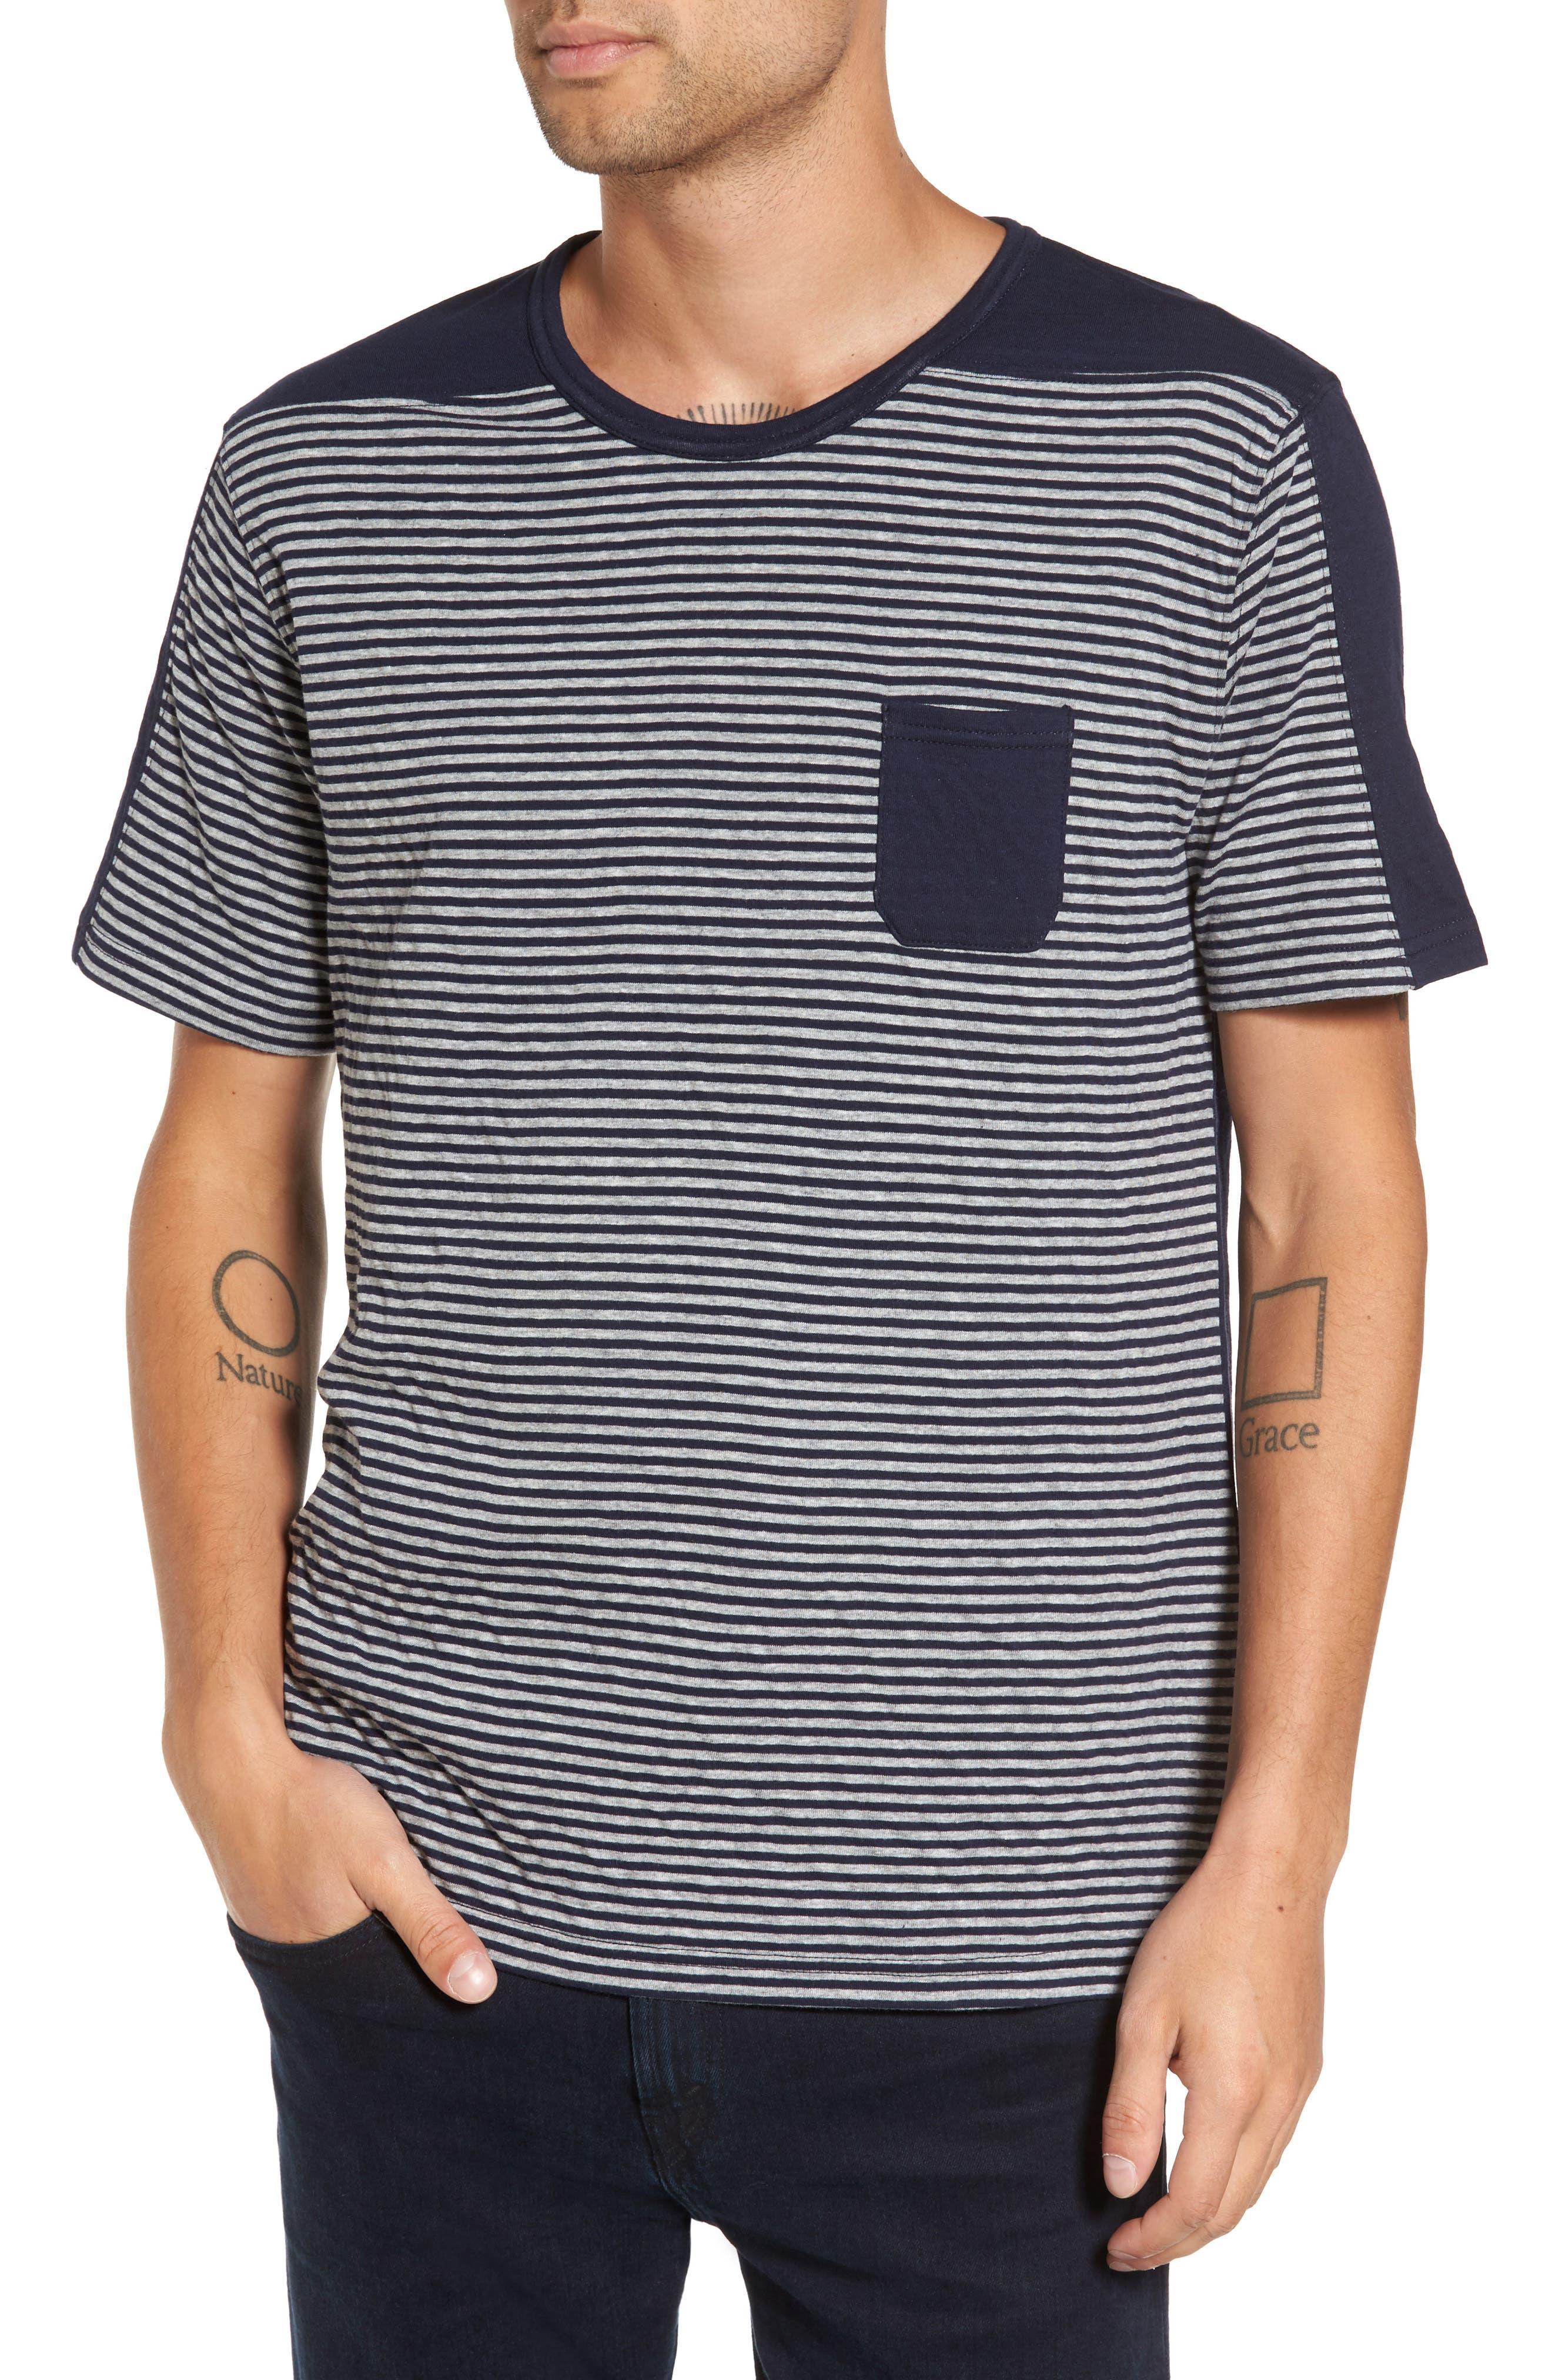 Striped Pocket T-Shirt,                         Main,                         color, Navy/ White Stripe